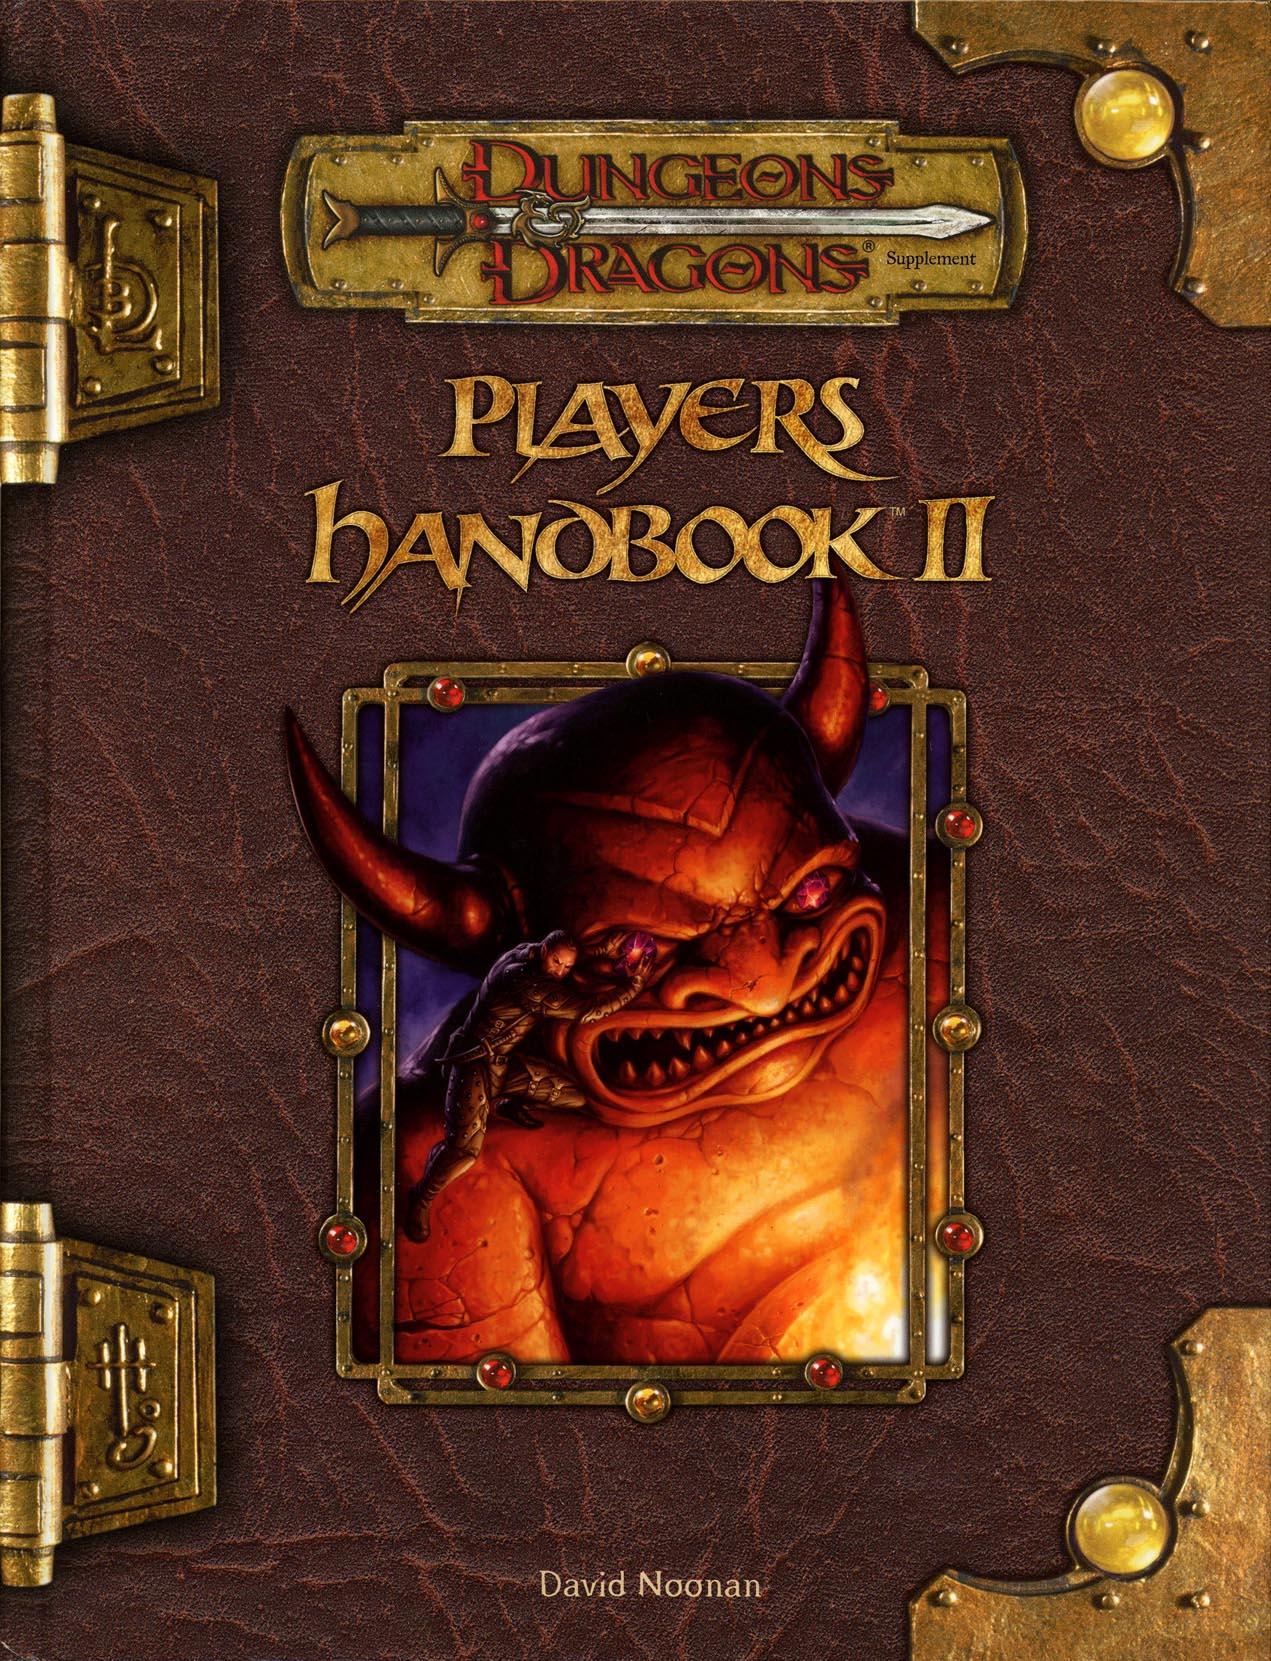 3.5 players handbook races